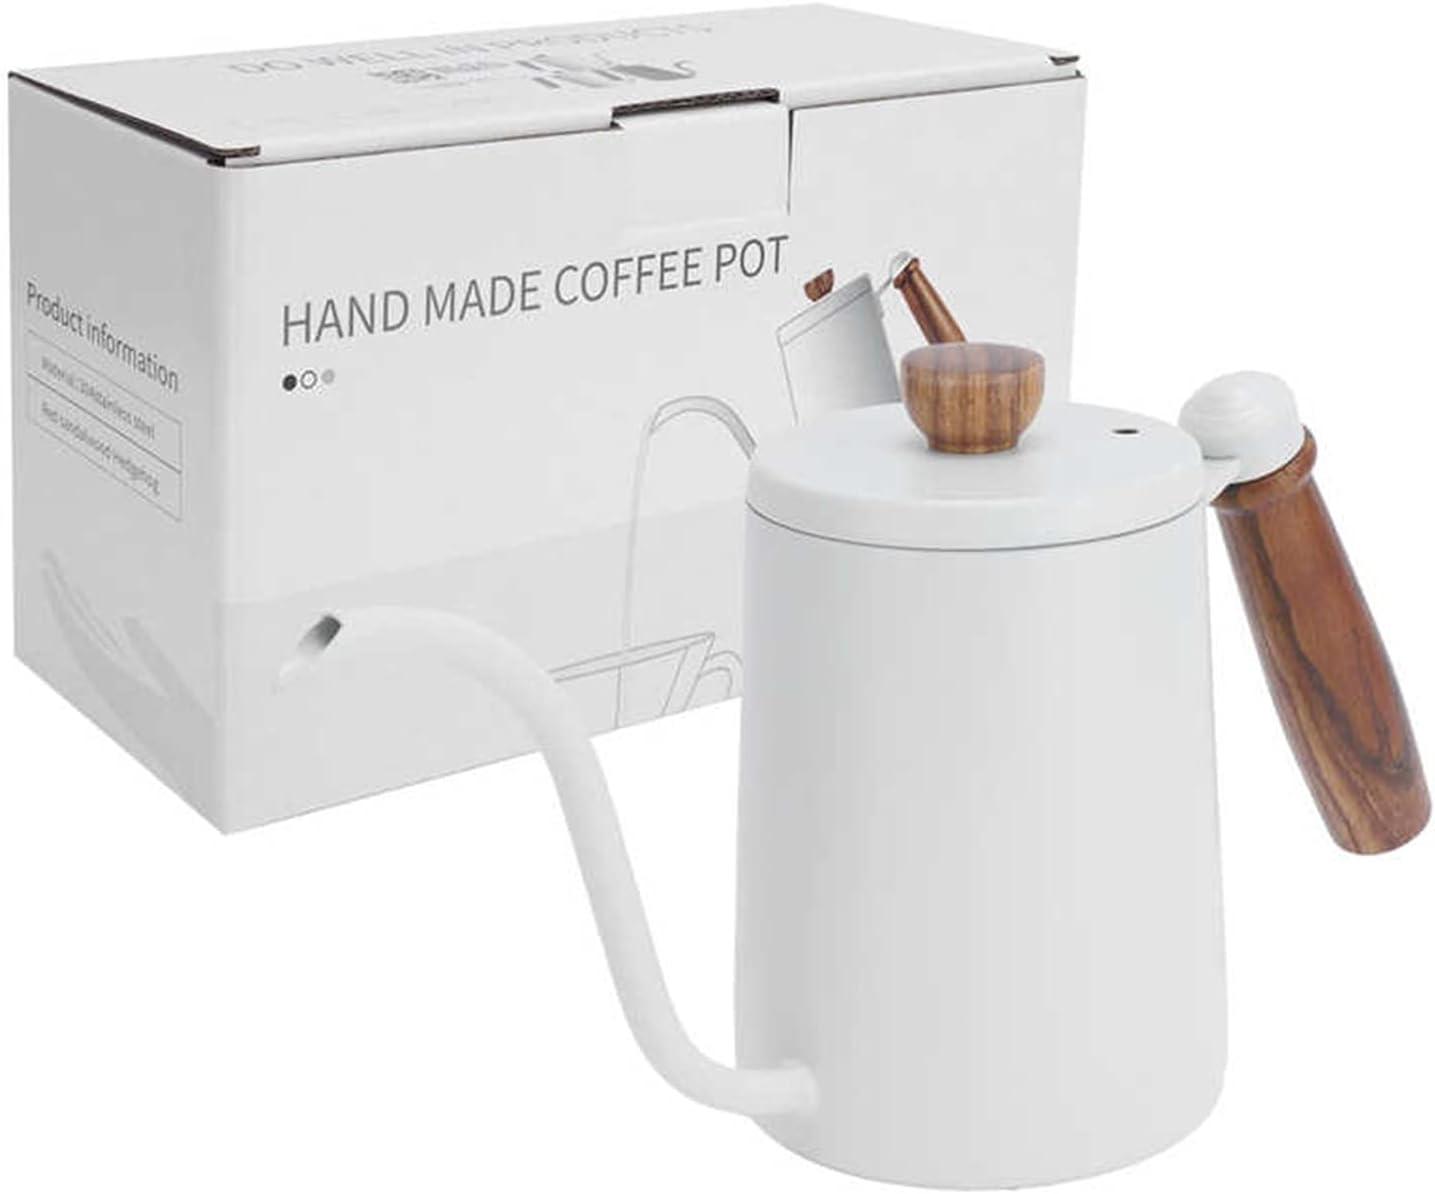 Coffee Filters 600ML Coffee Pot 304 Stainless Steel Fingerprint